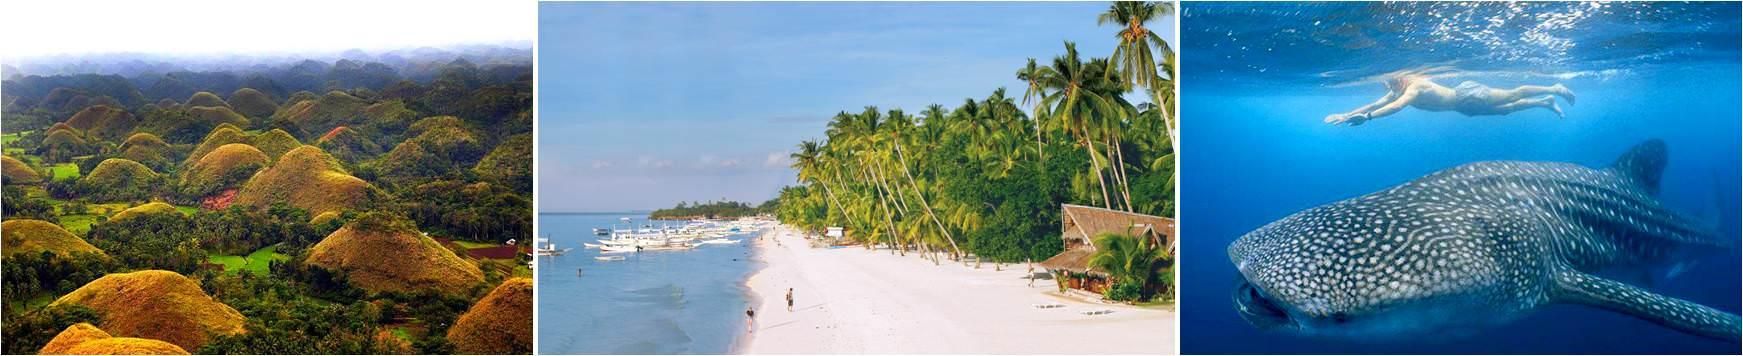 turismo en filipinas-Bohol